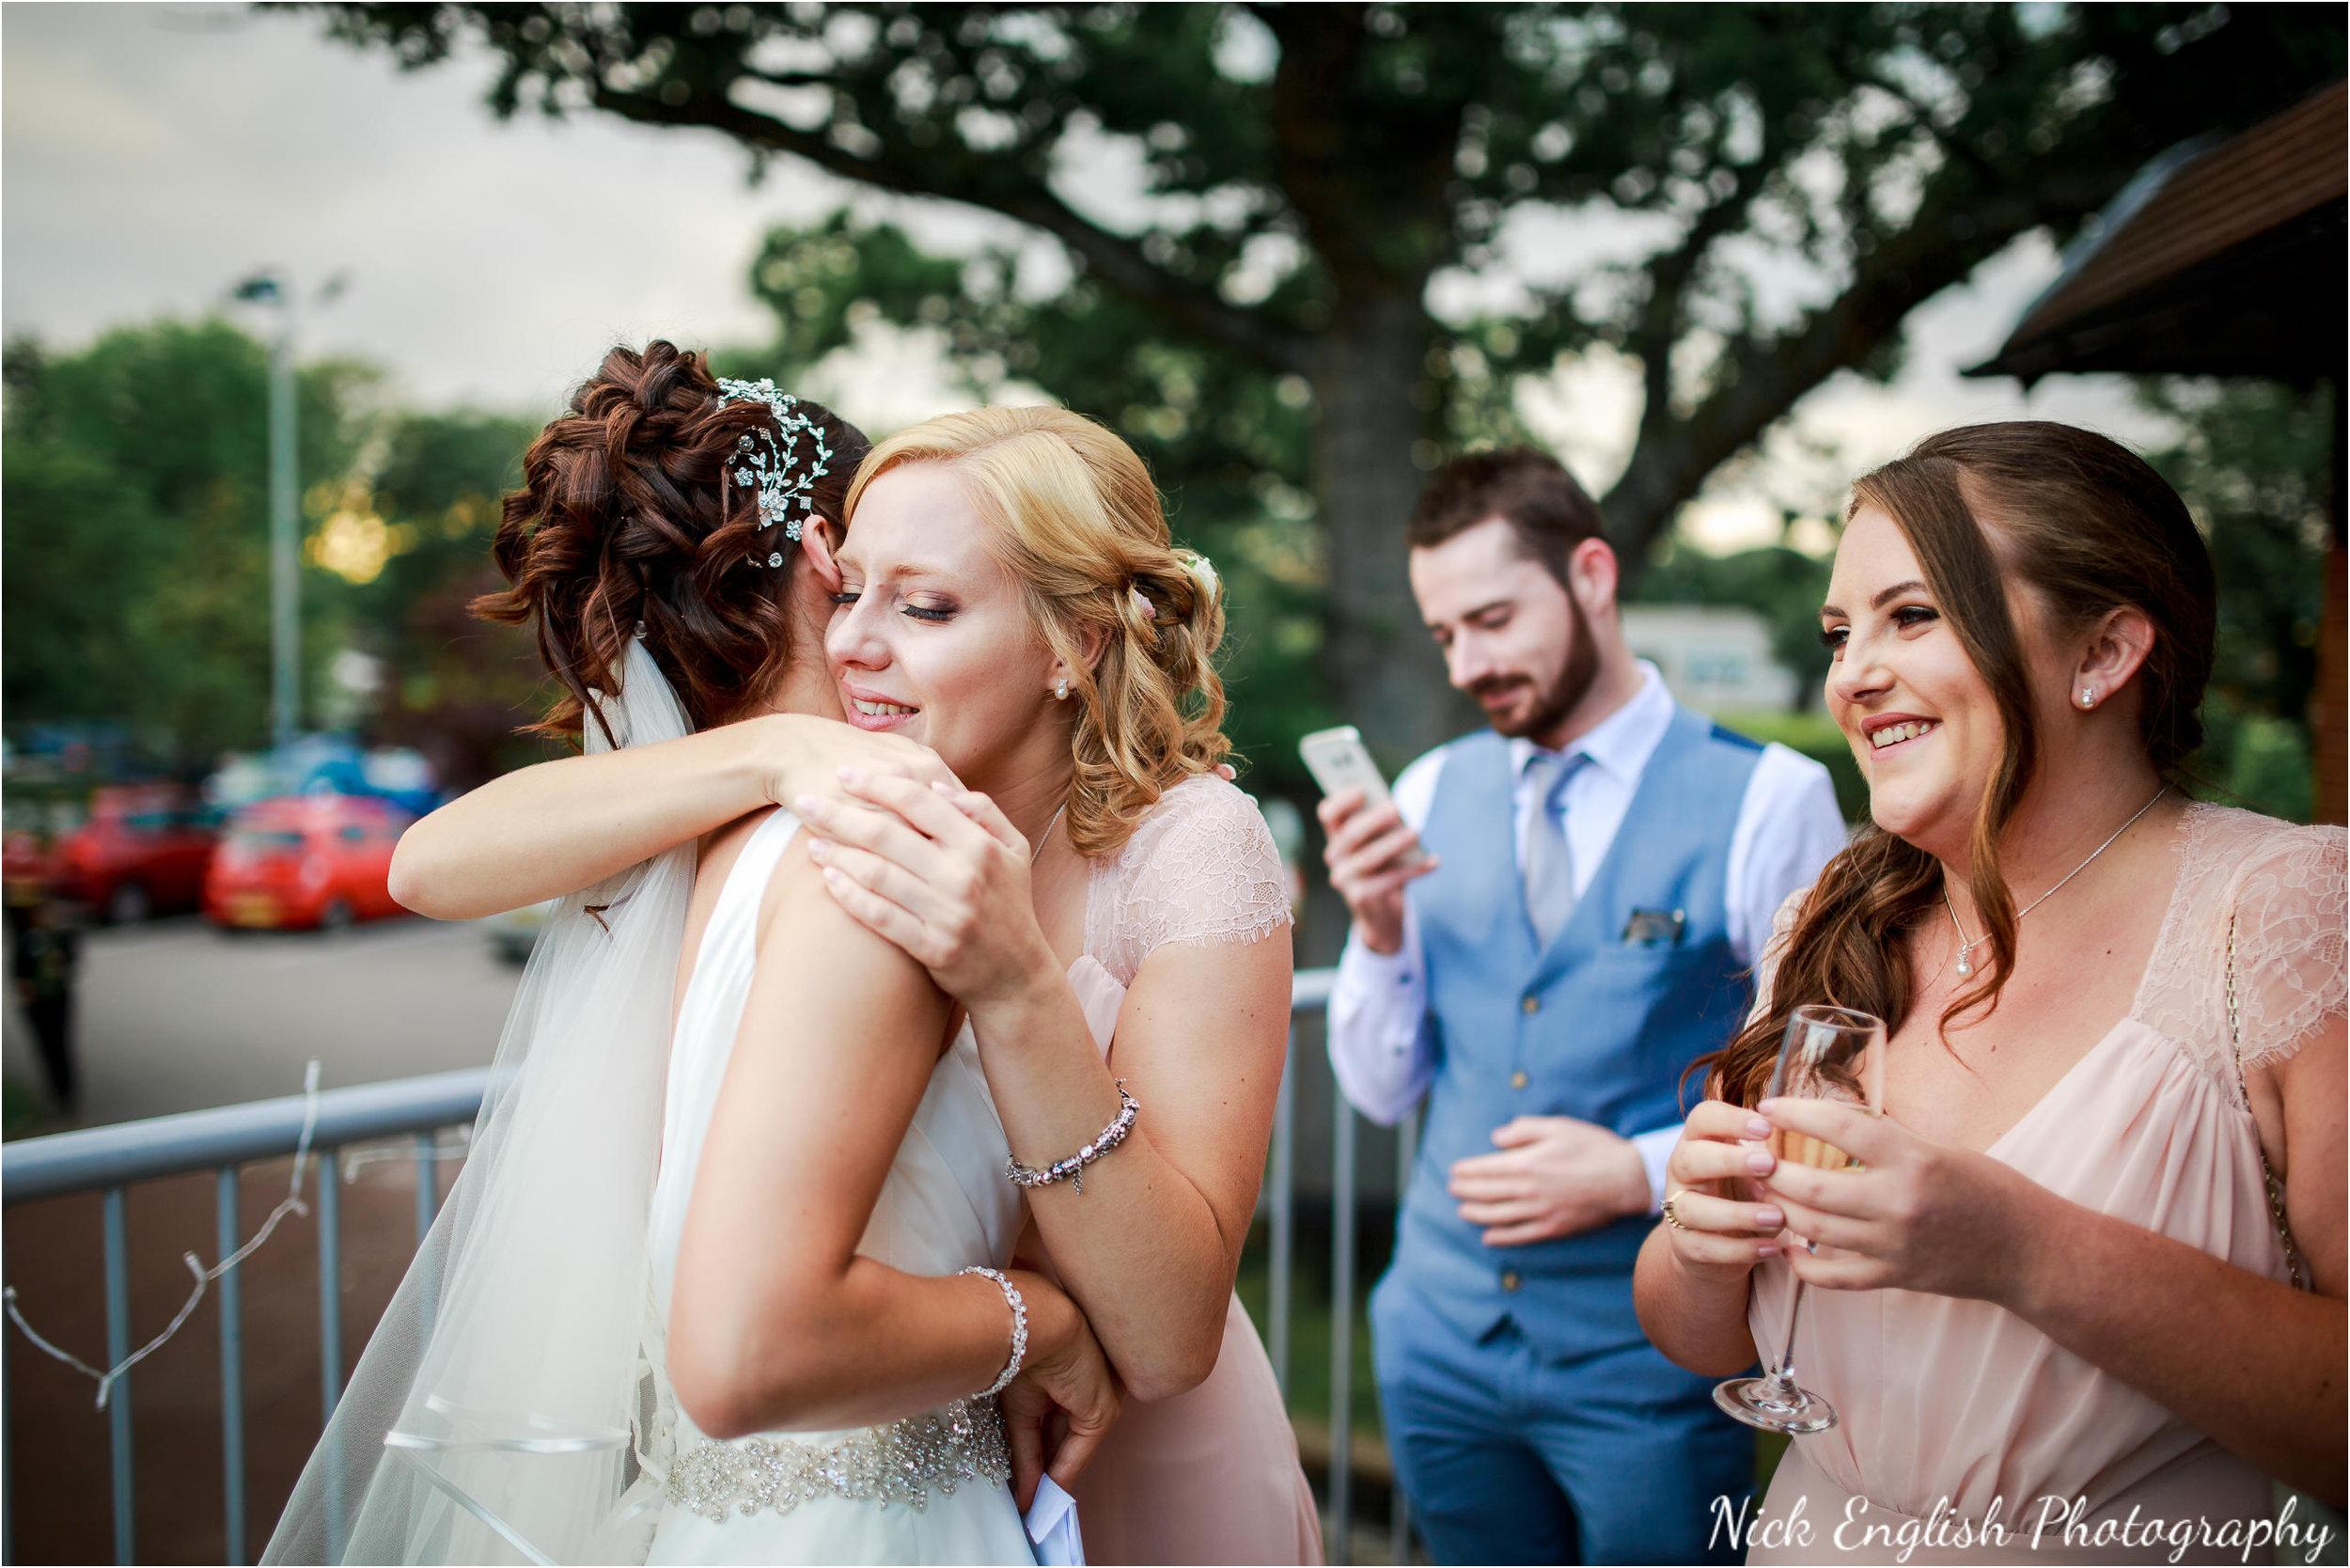 Emily David Wedding Photographs at Barton Grange Preston by Nick English Photography 212jpg.jpeg